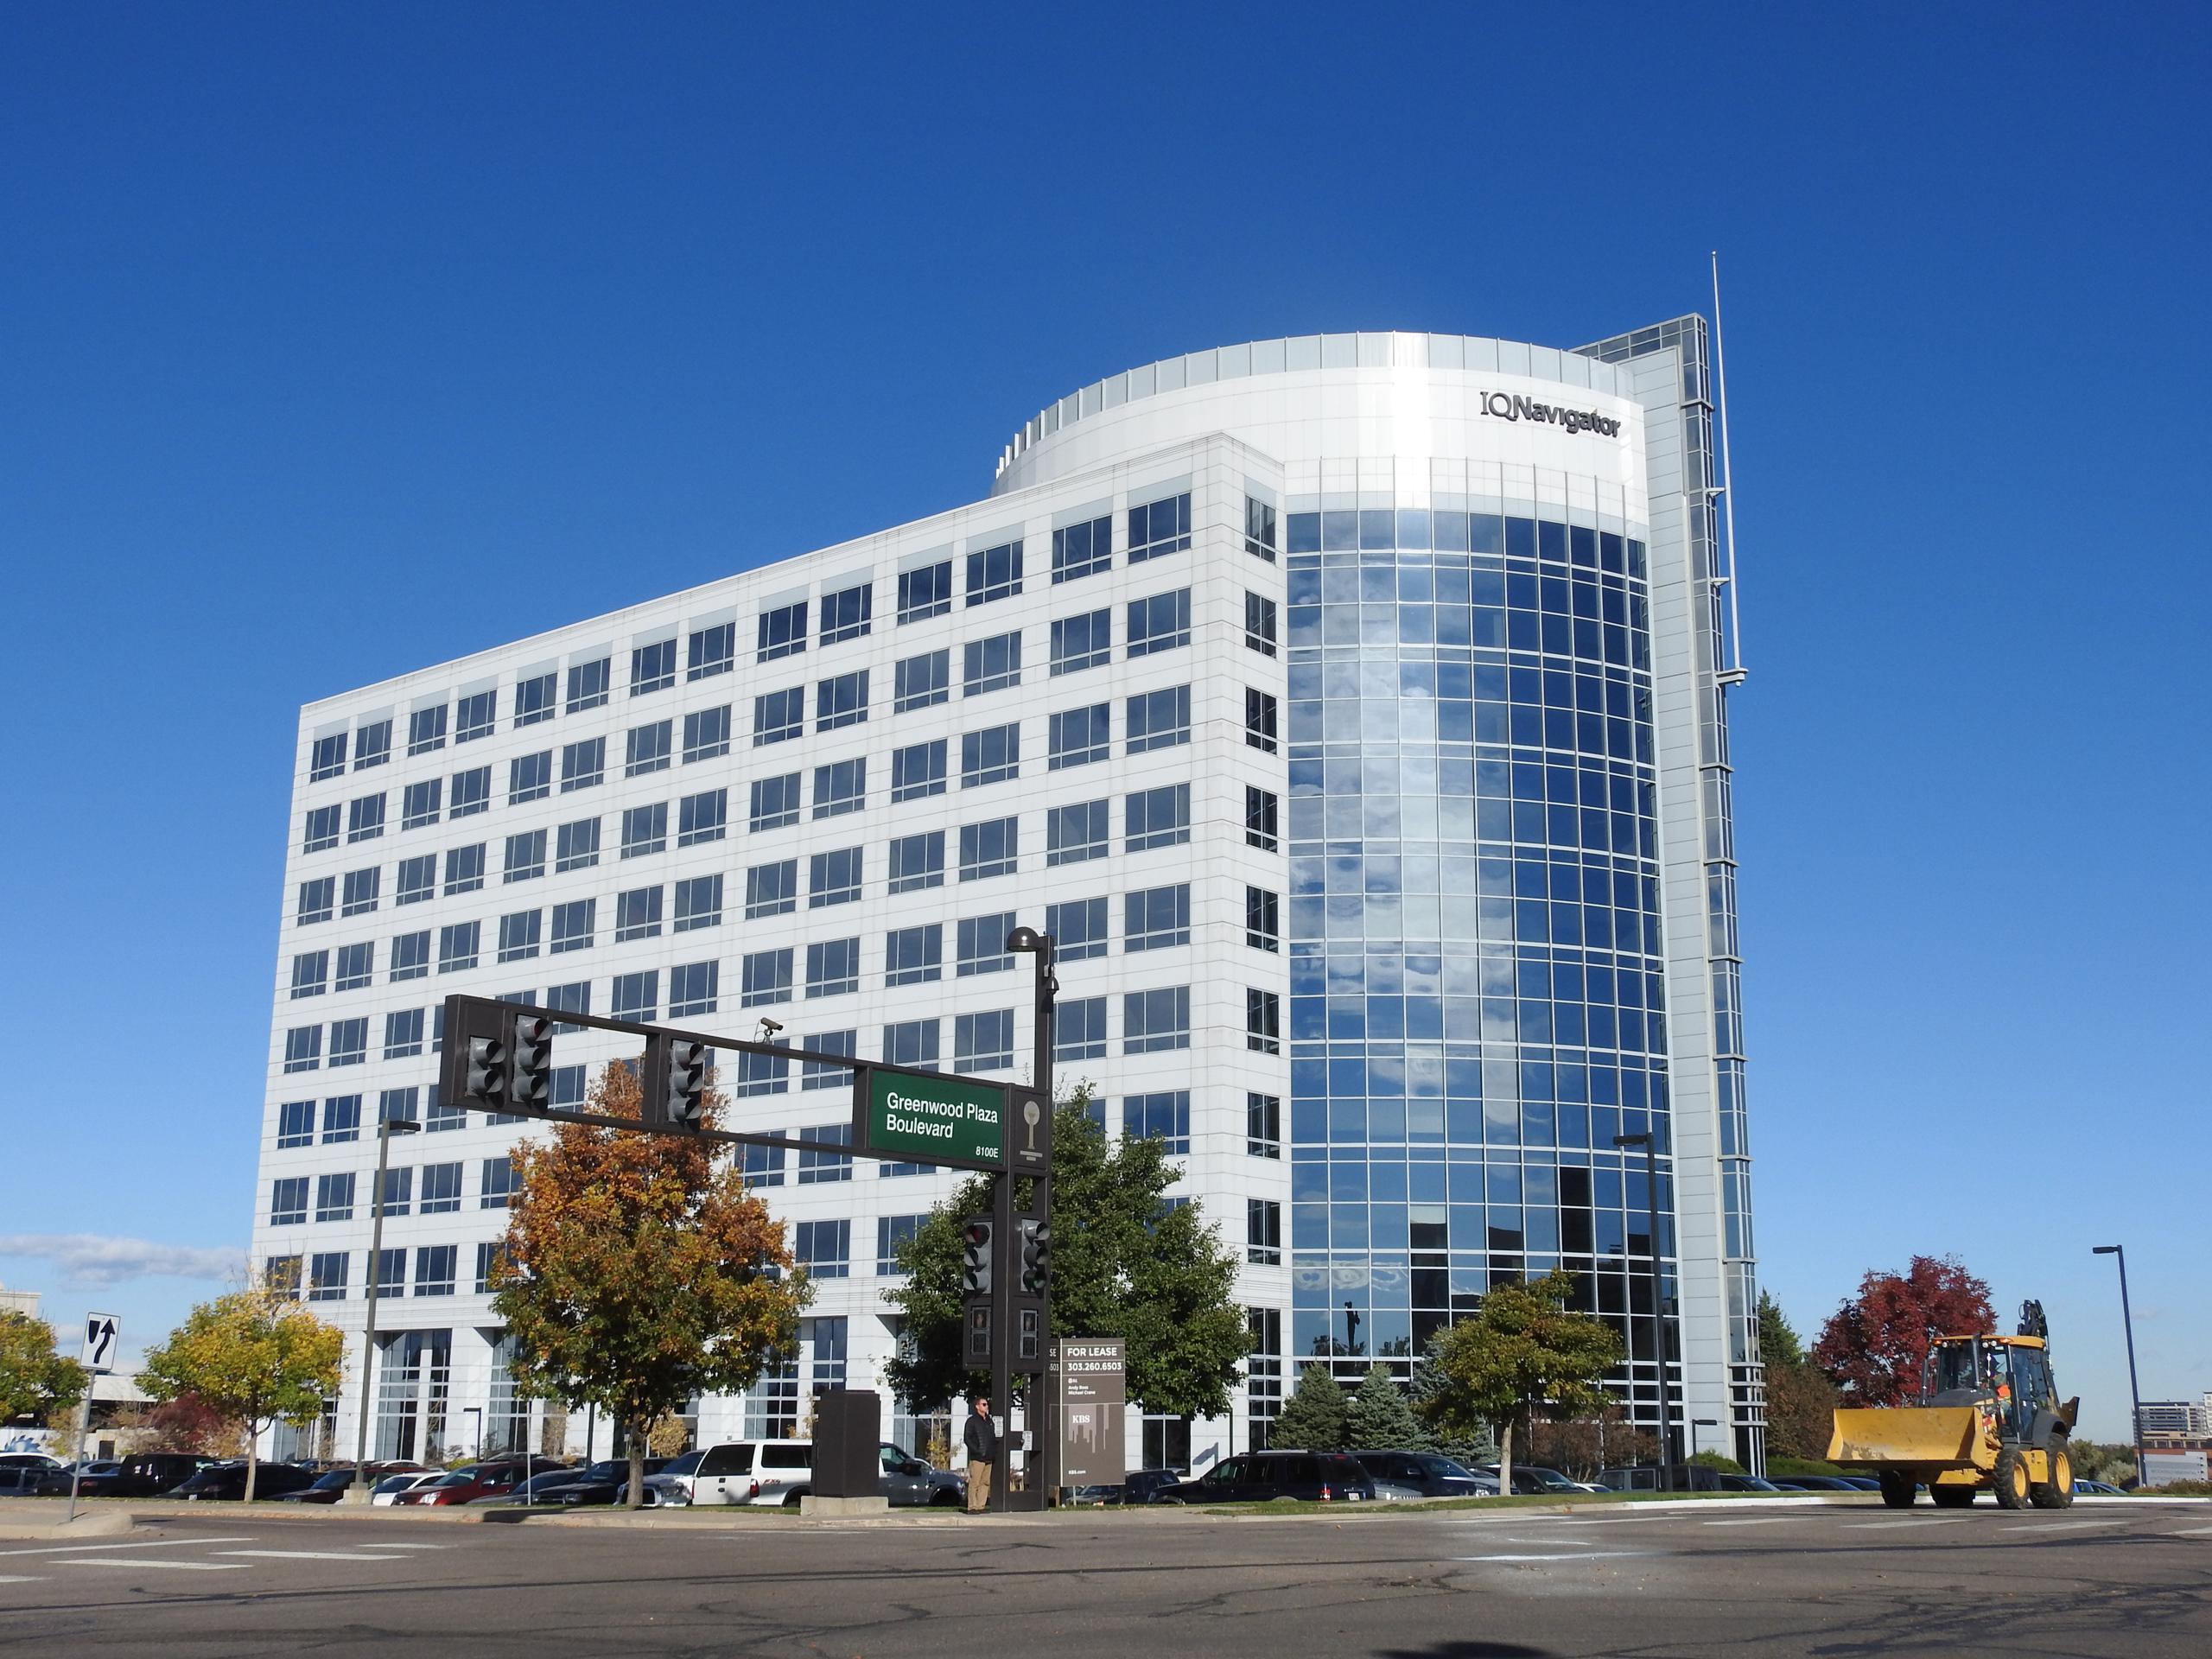 IQNavigator's corporate headquarters in Centennial, Colorado.